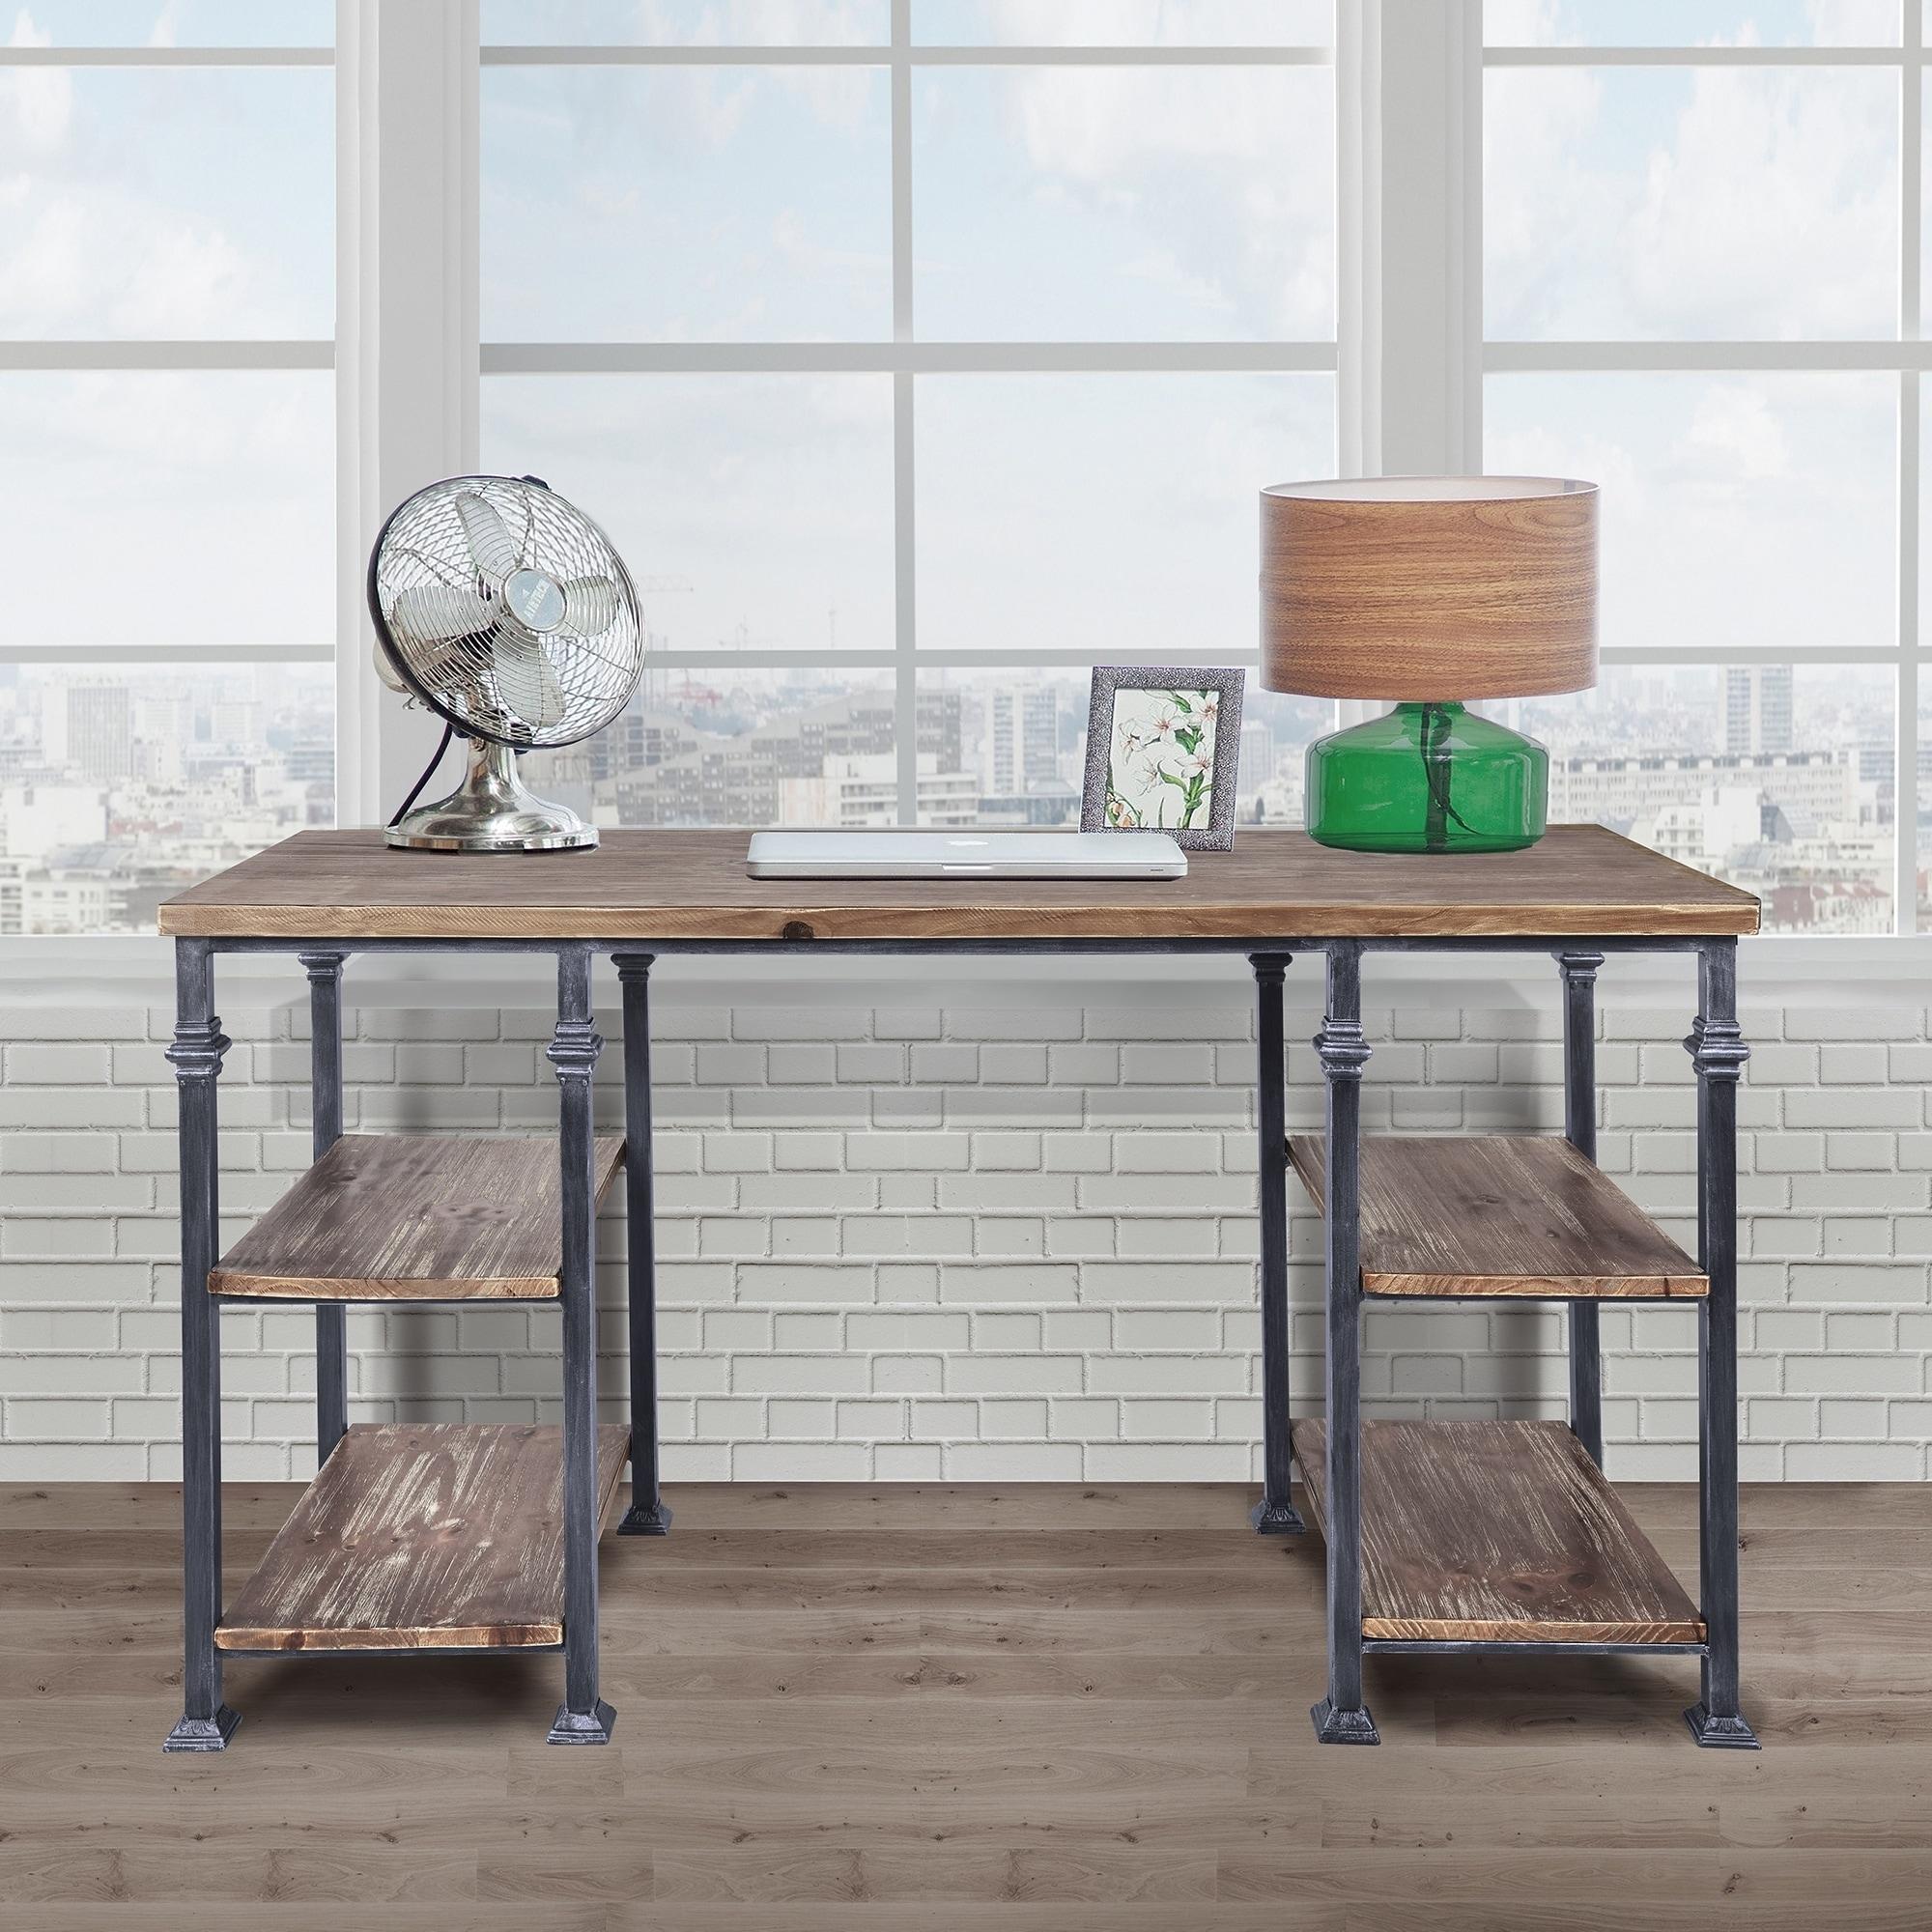 Armen Living Liam Industrial Desk in Industrial Grey and Pine Wood Top